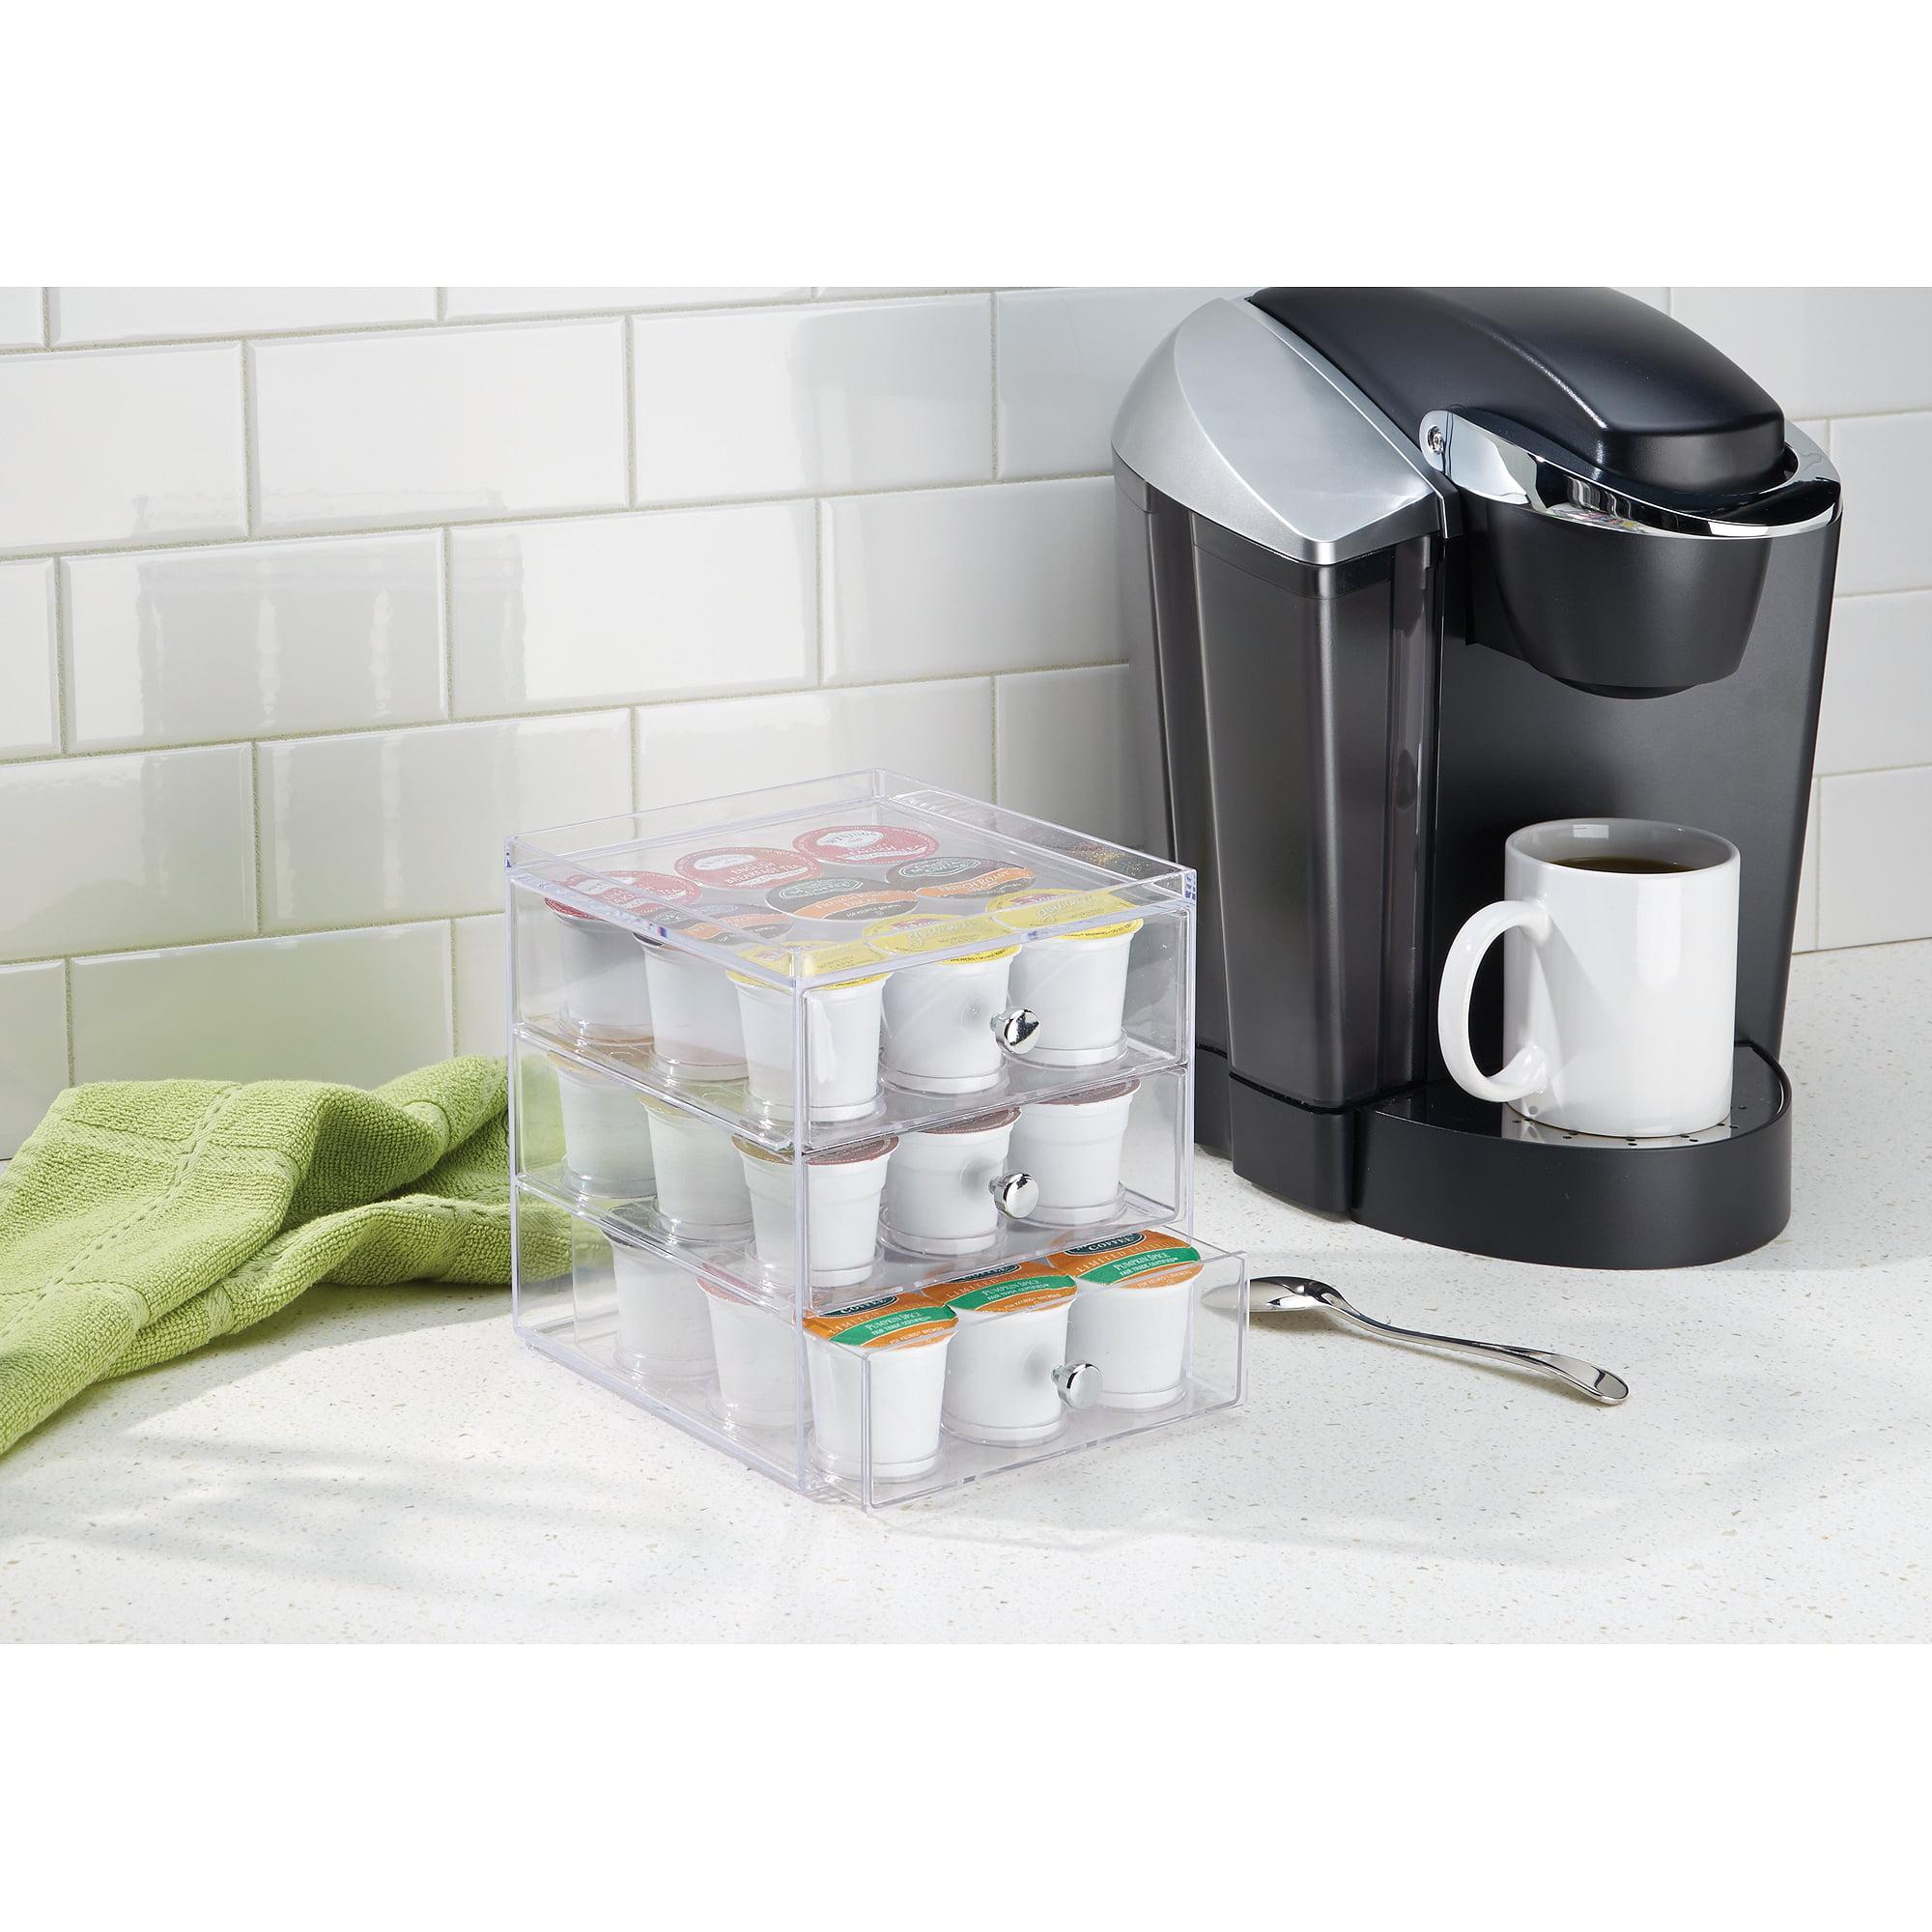 Interdesign Single Serve Coffee Pod Holder For Kitchen